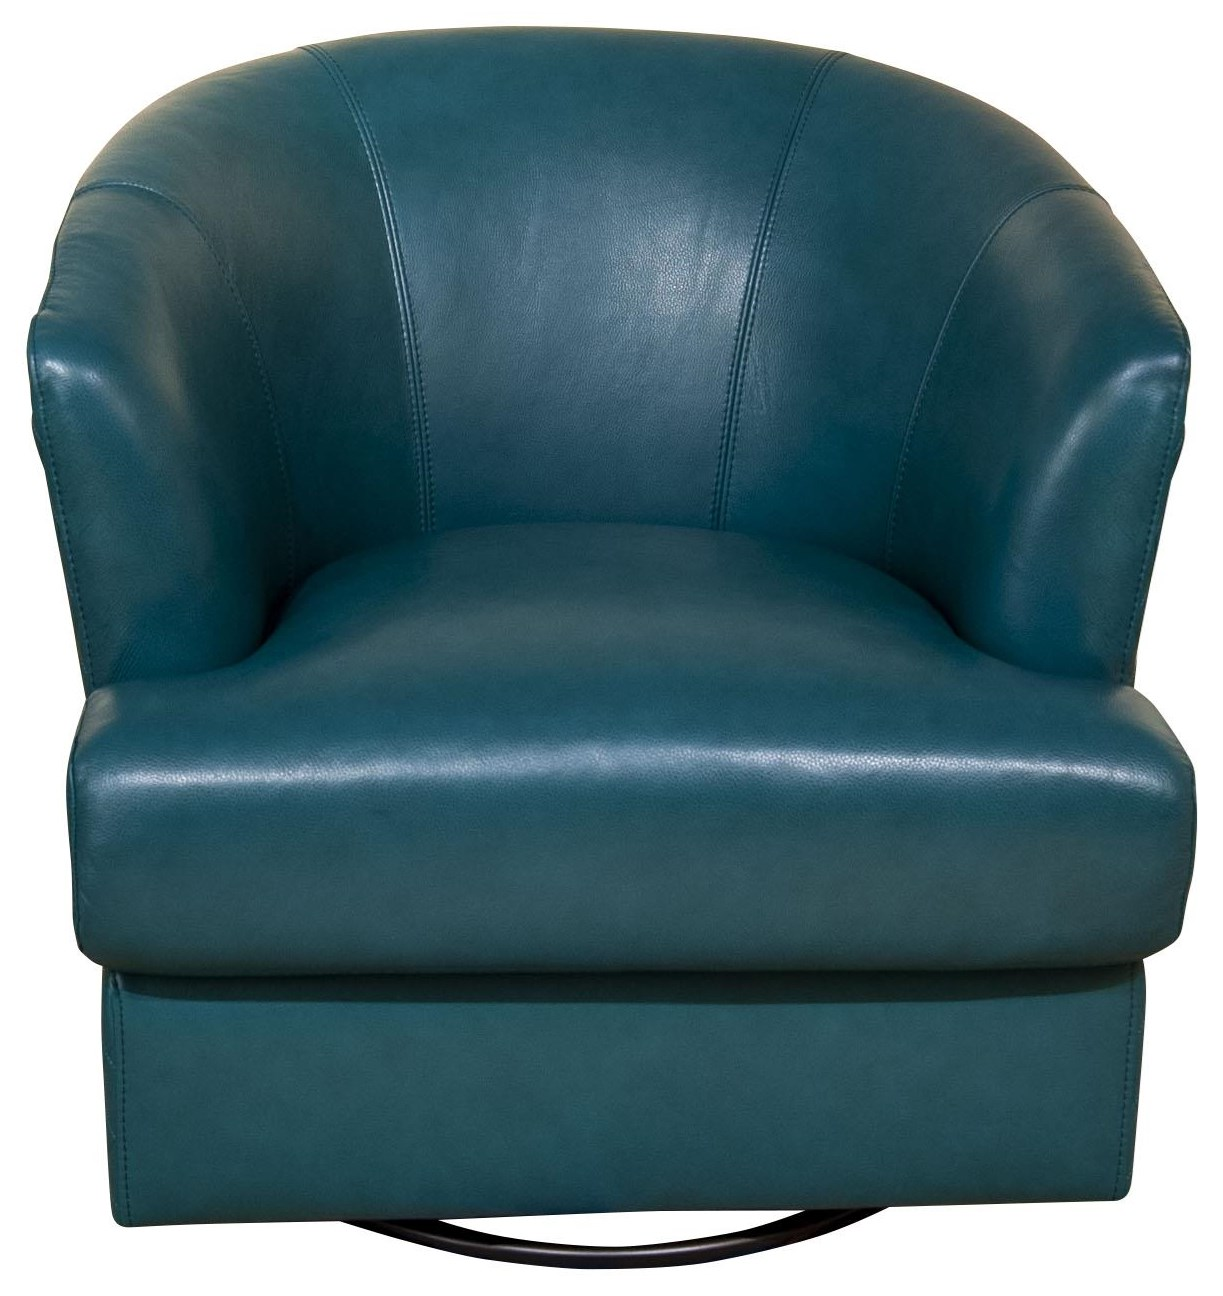 Lianna- Lianna Leather Swivel Chair by Abbyson at Morris Home